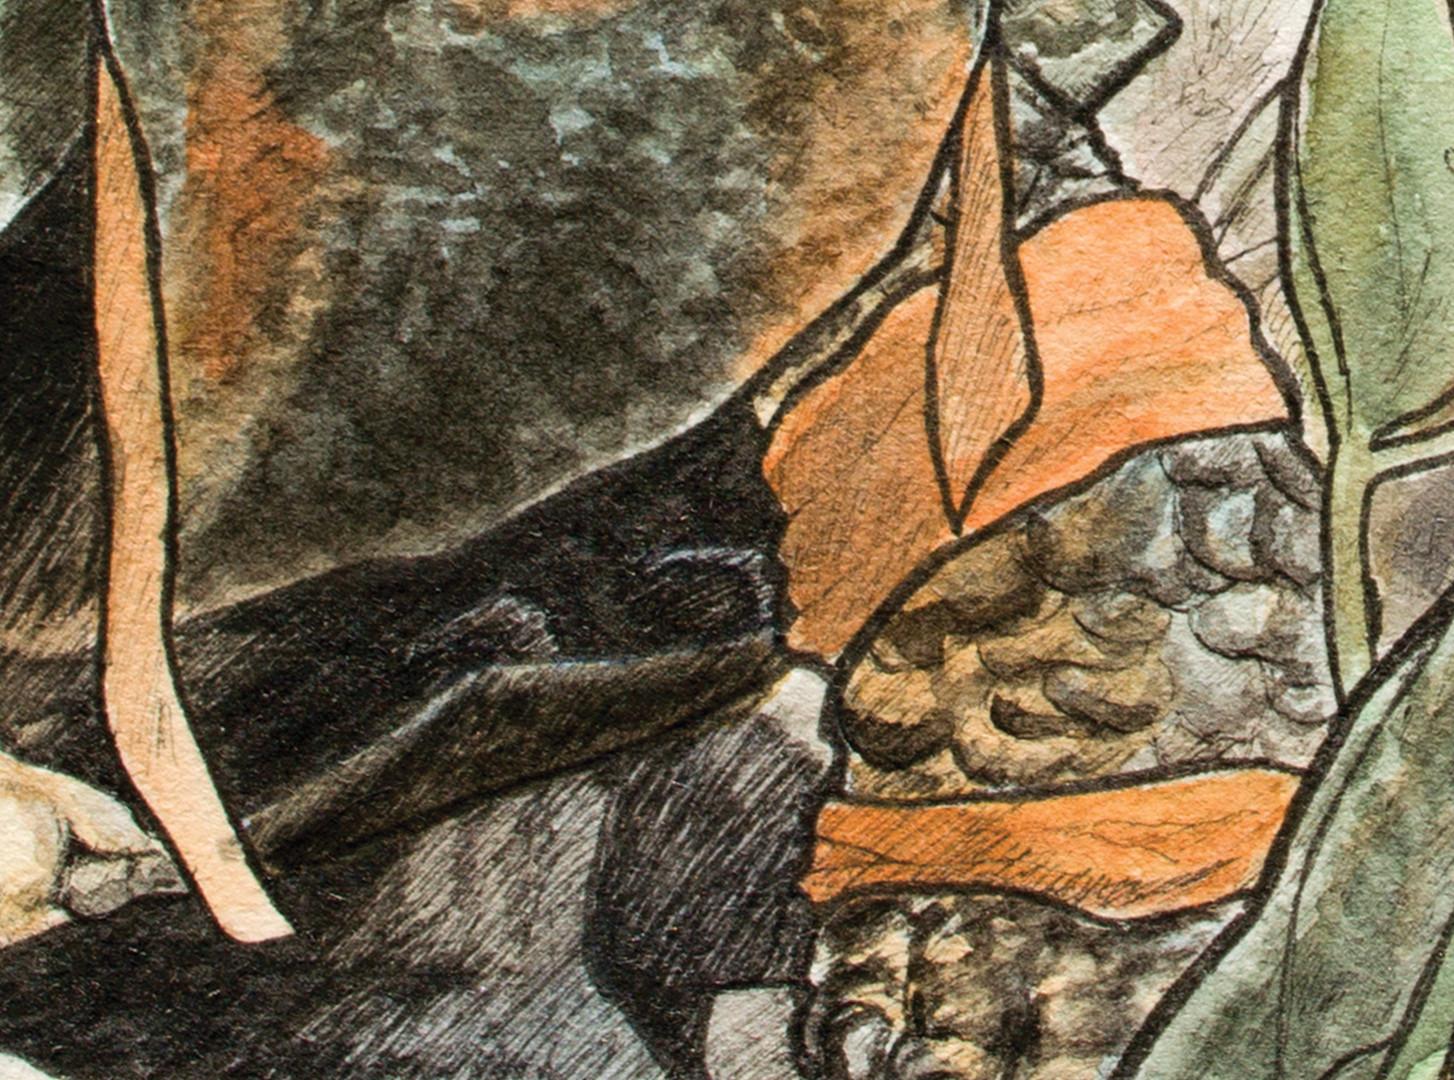 Michelangelo neck and leg detail